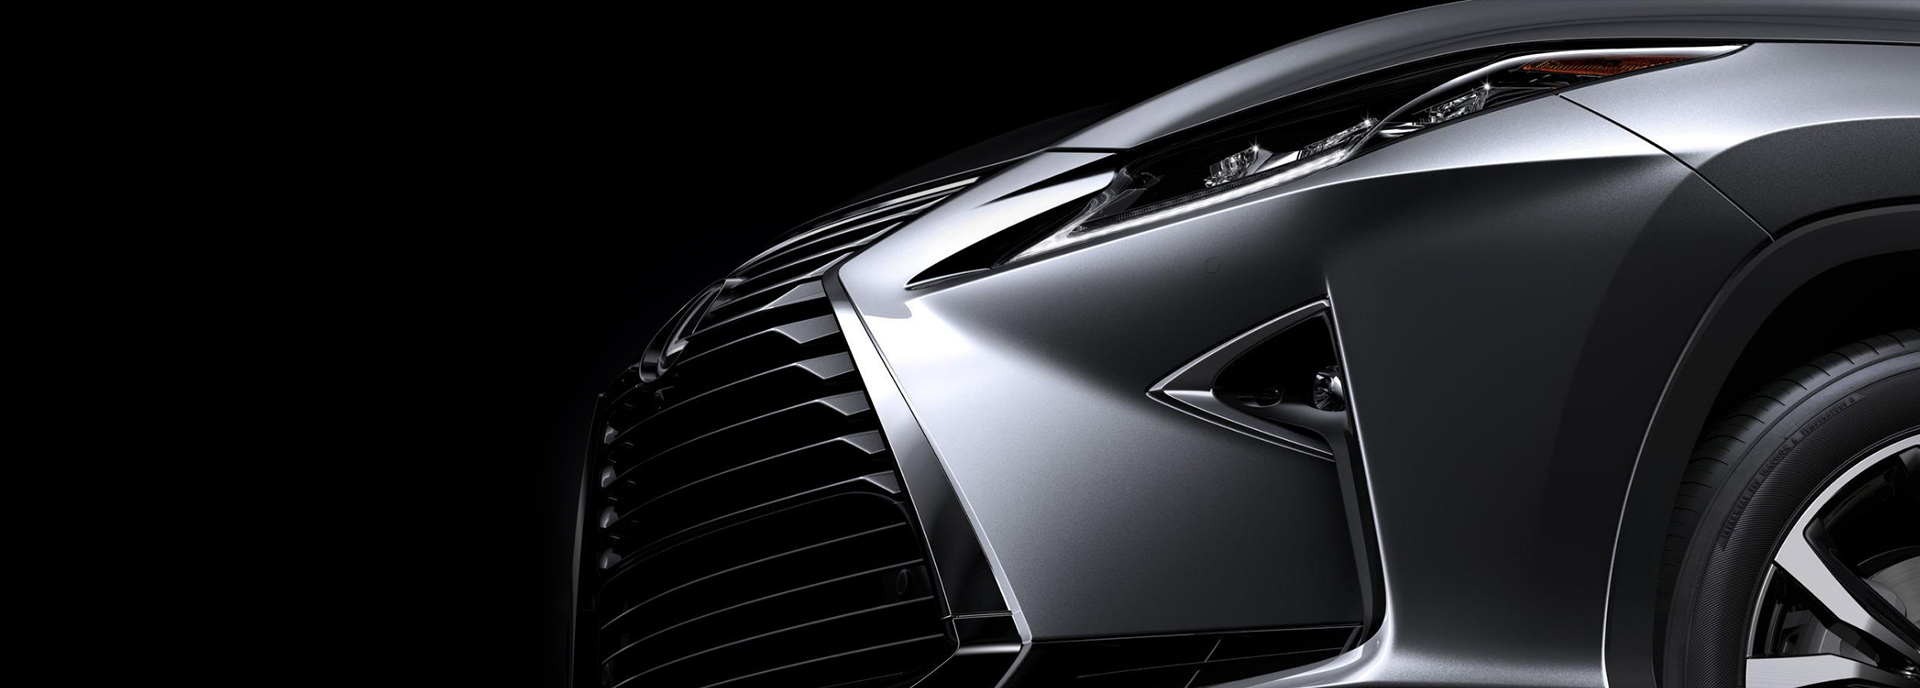 Copy of Copy of Lexus Bratislava Retailer Image